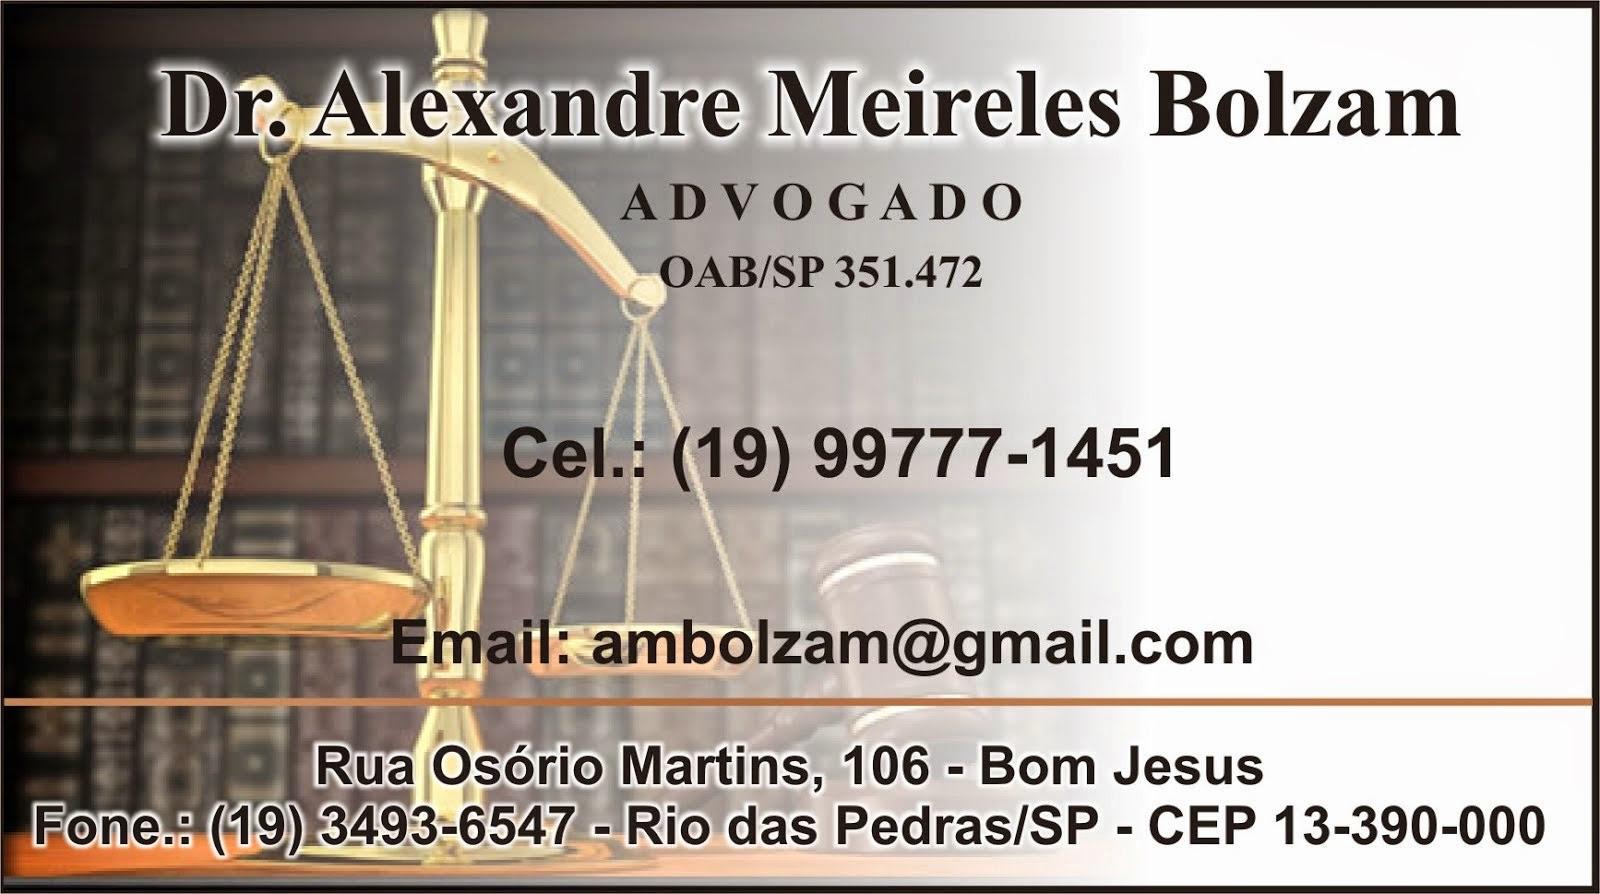 DR. ALEXANDRE MEIRELES BOLZAM